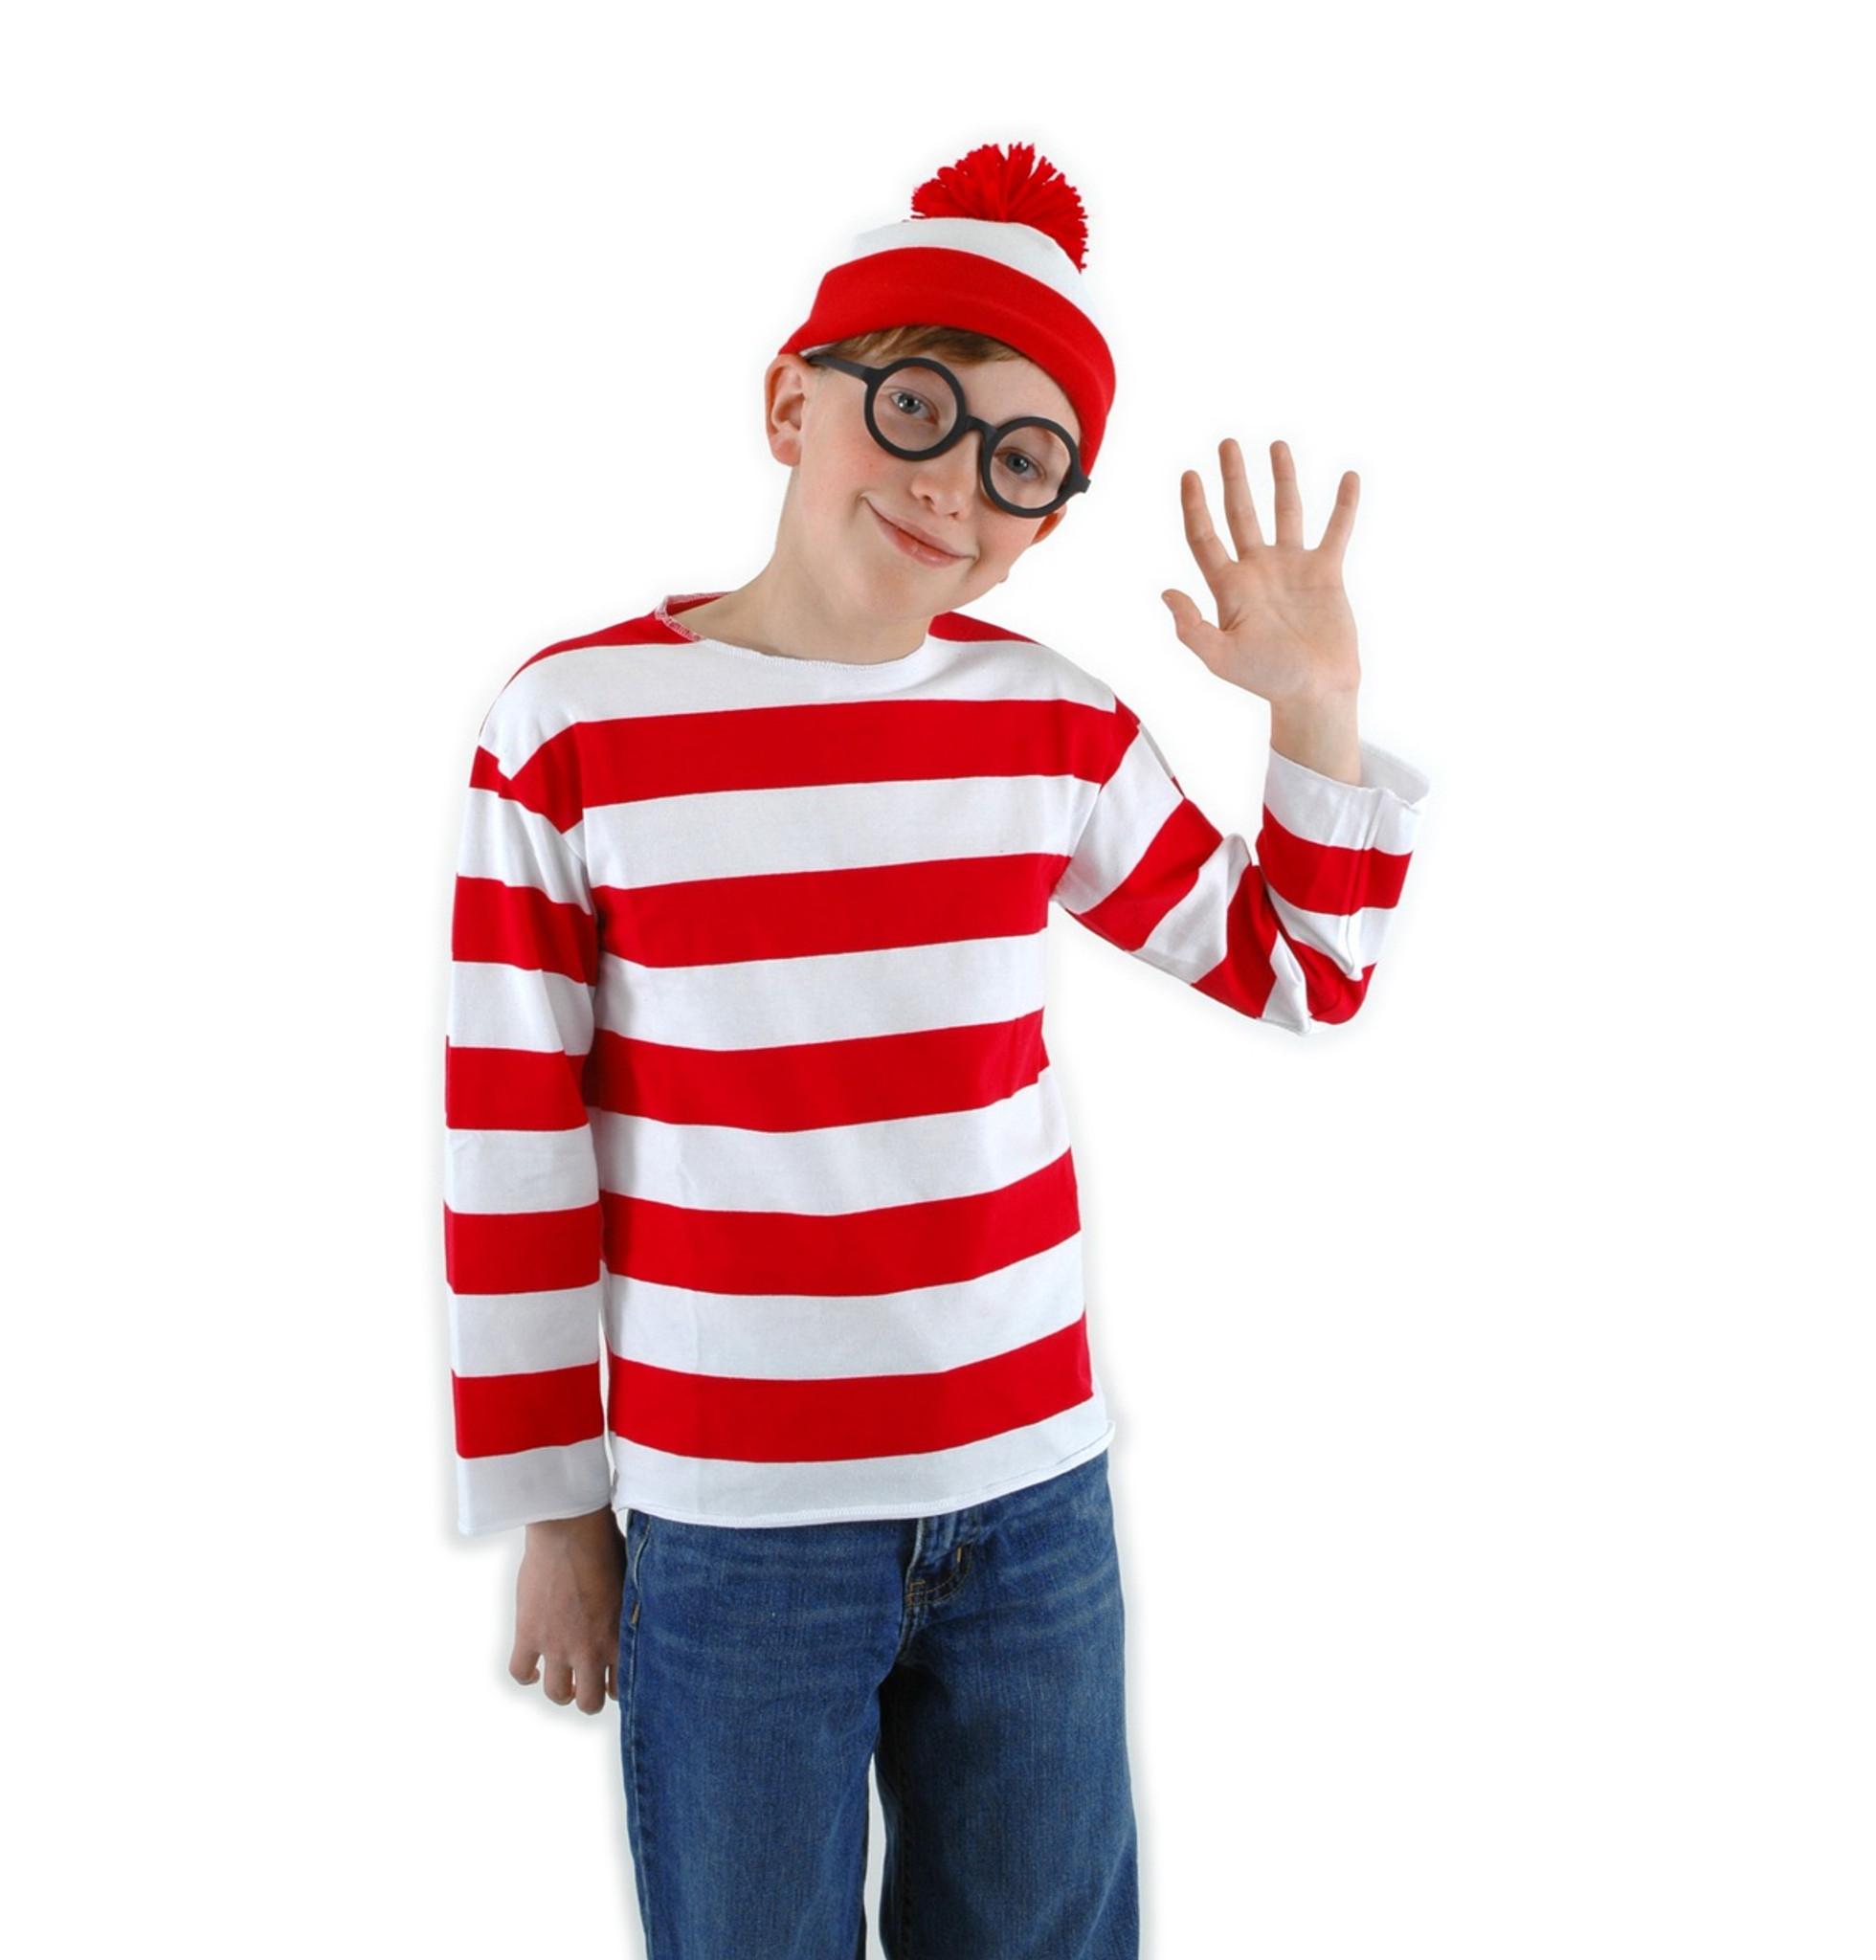 Waldo hat